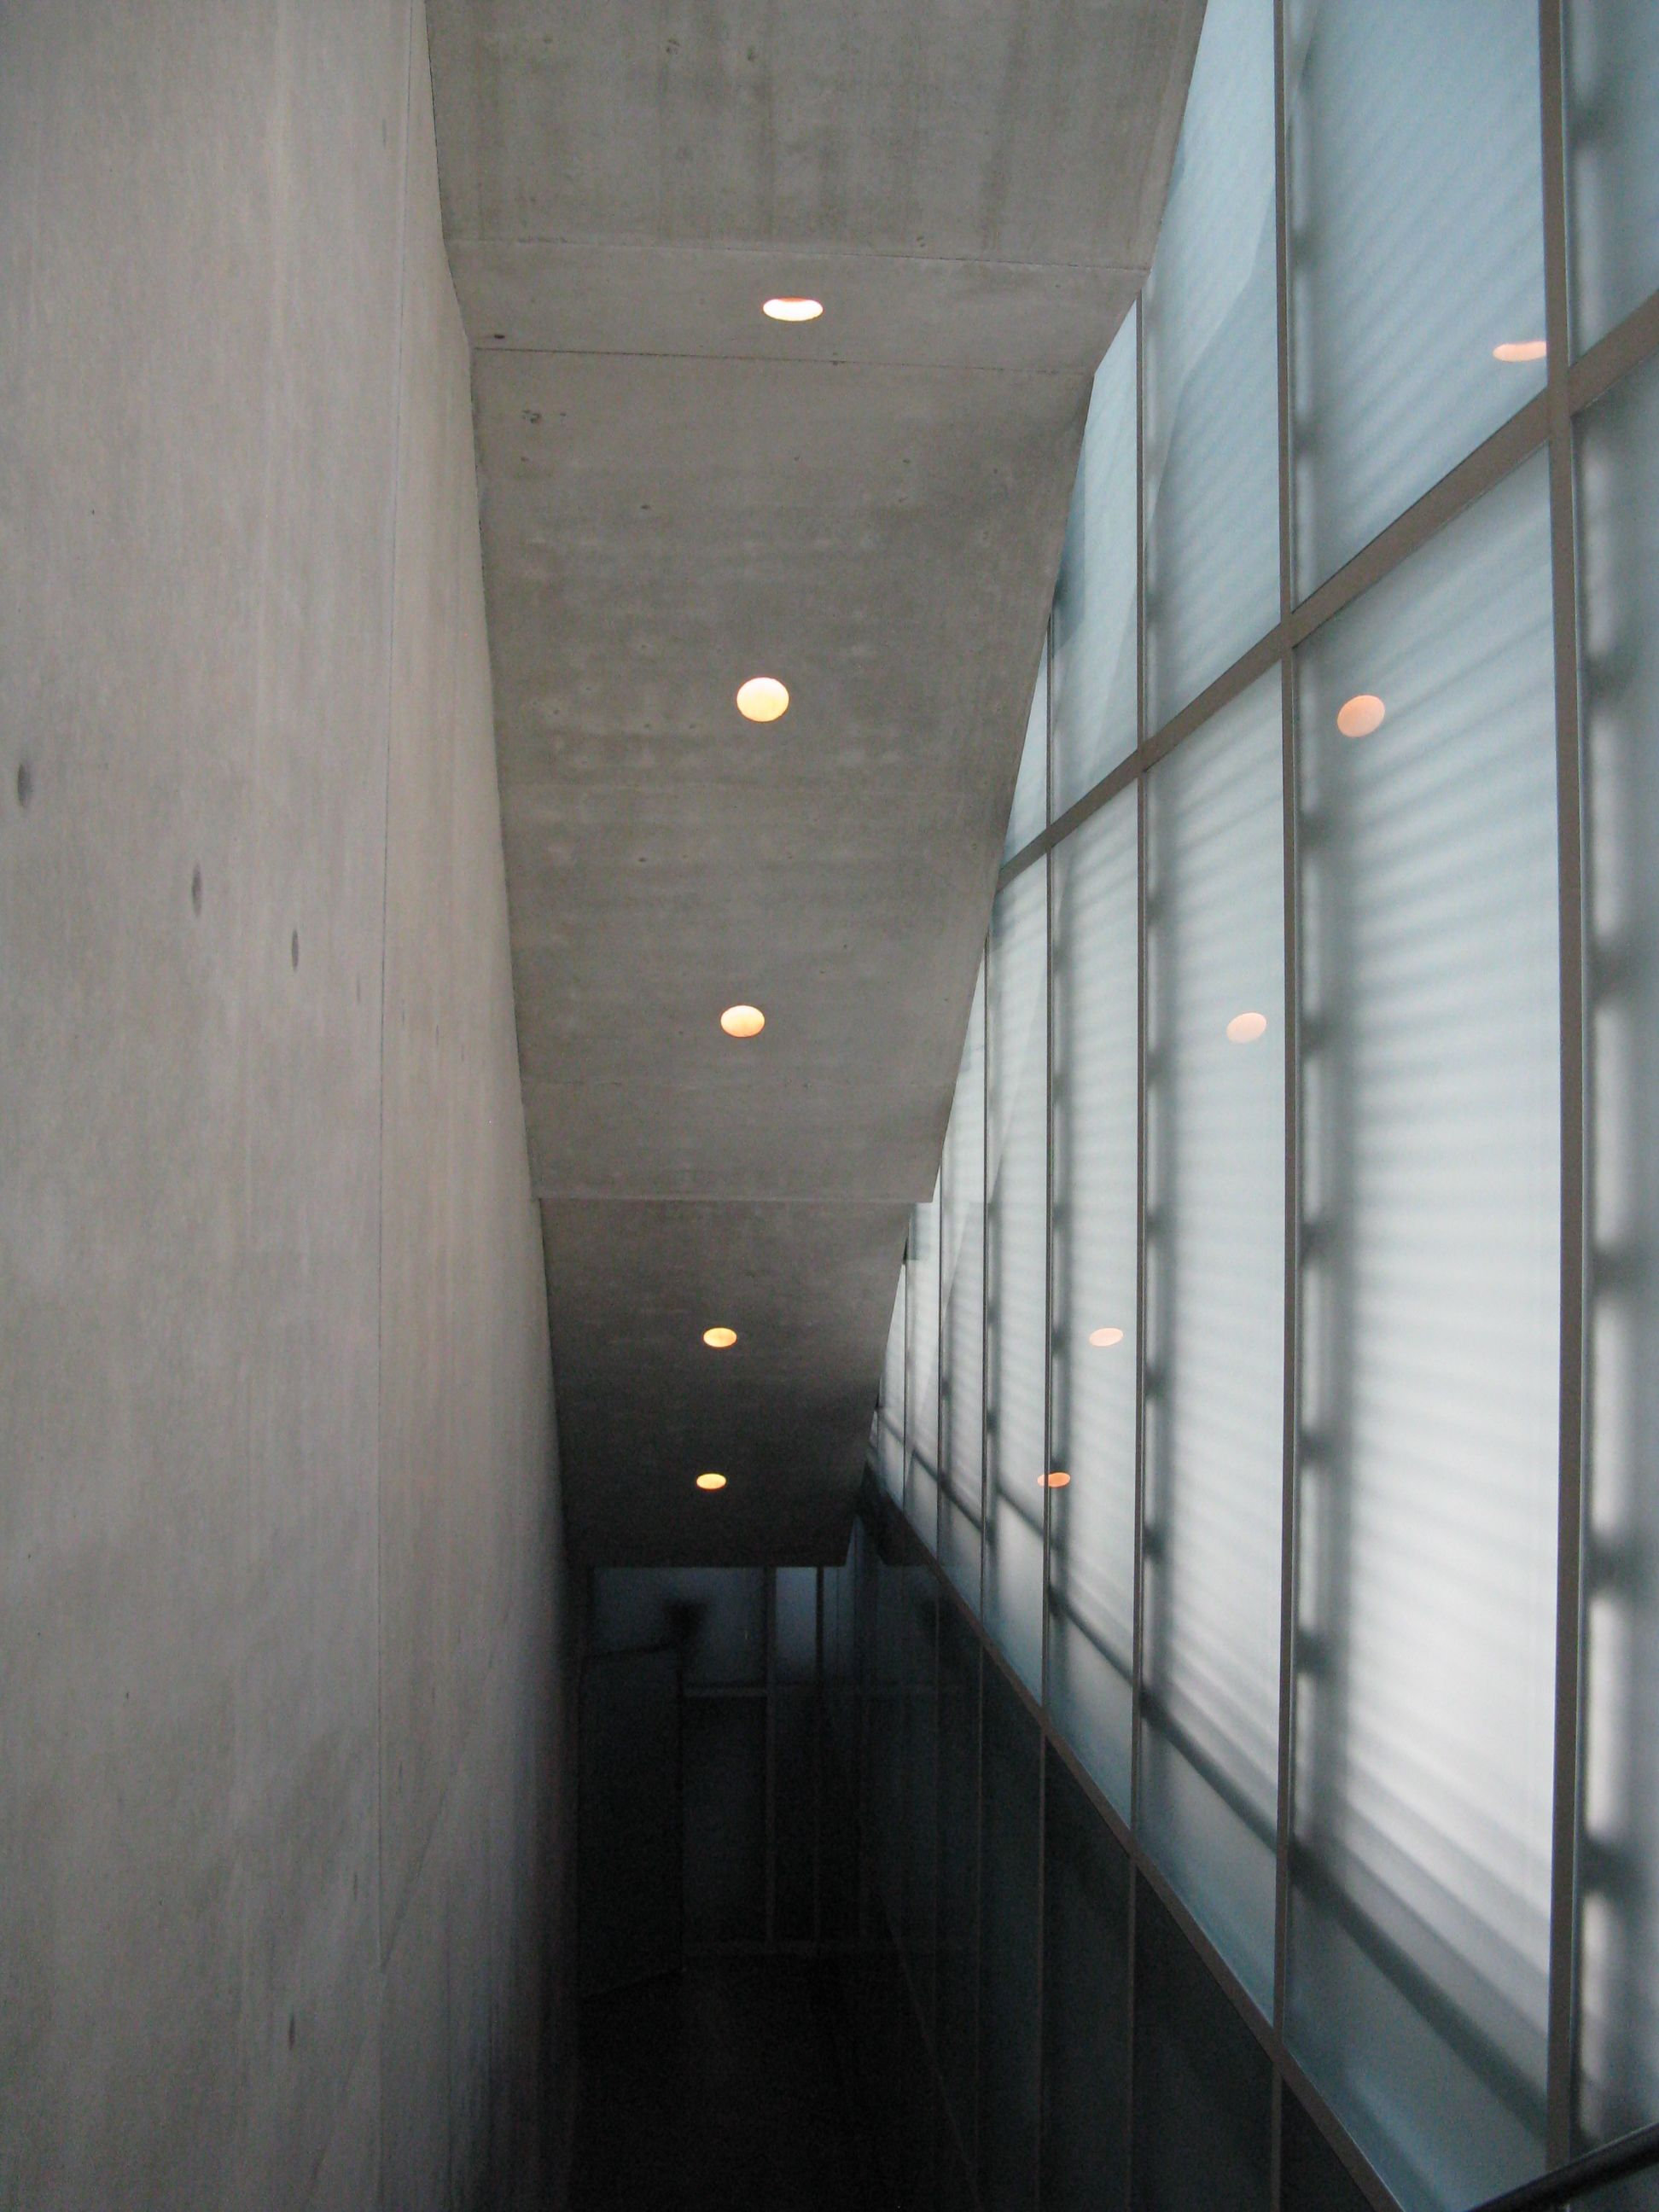 Peter Zumthor Kunsthaus Bregenz ピーターズントー, 美術館, ピーター